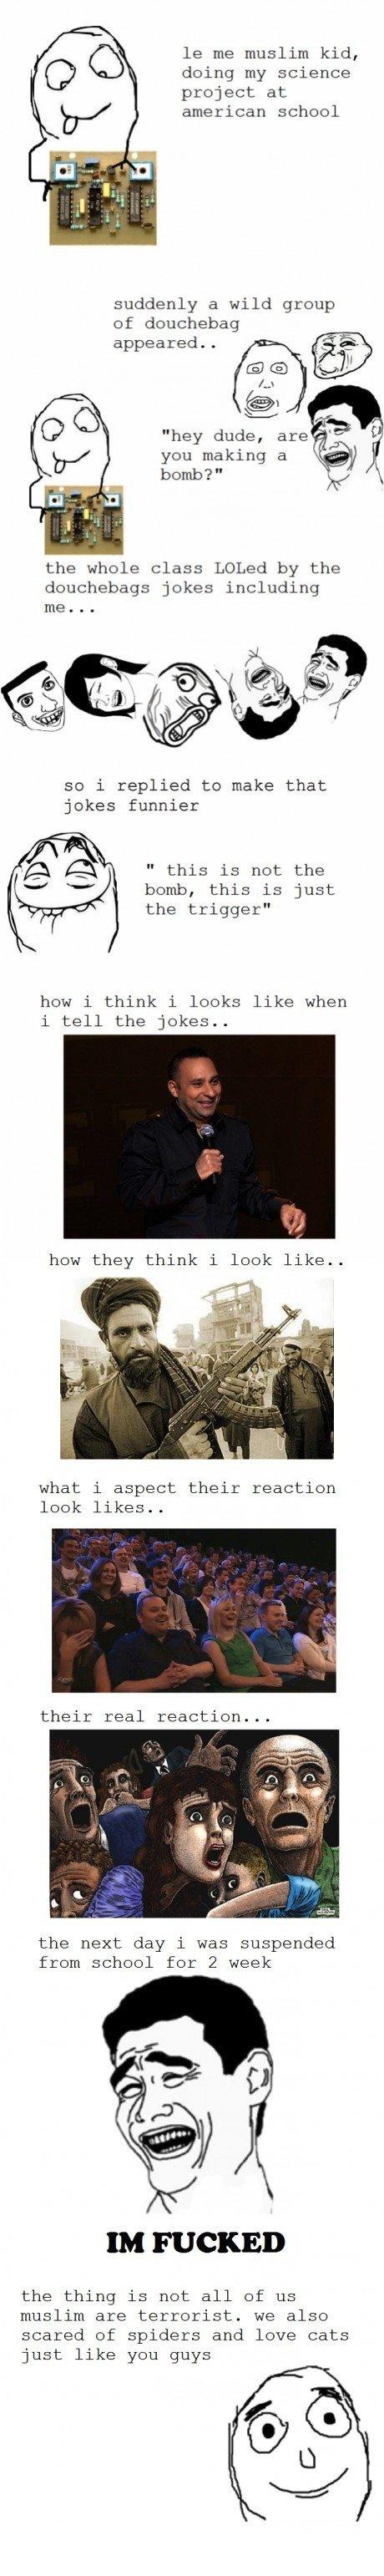 me. EDIT: OSLKASLKDJFASDIJFIOJWE I LOVE YOU FUNNY JUNK #1 SPOT!!!! harry potter anyone? funnyjunk.com/funny_pictures/3161372/hrry+pttr+cmp+1+1+one+1/. me muslim